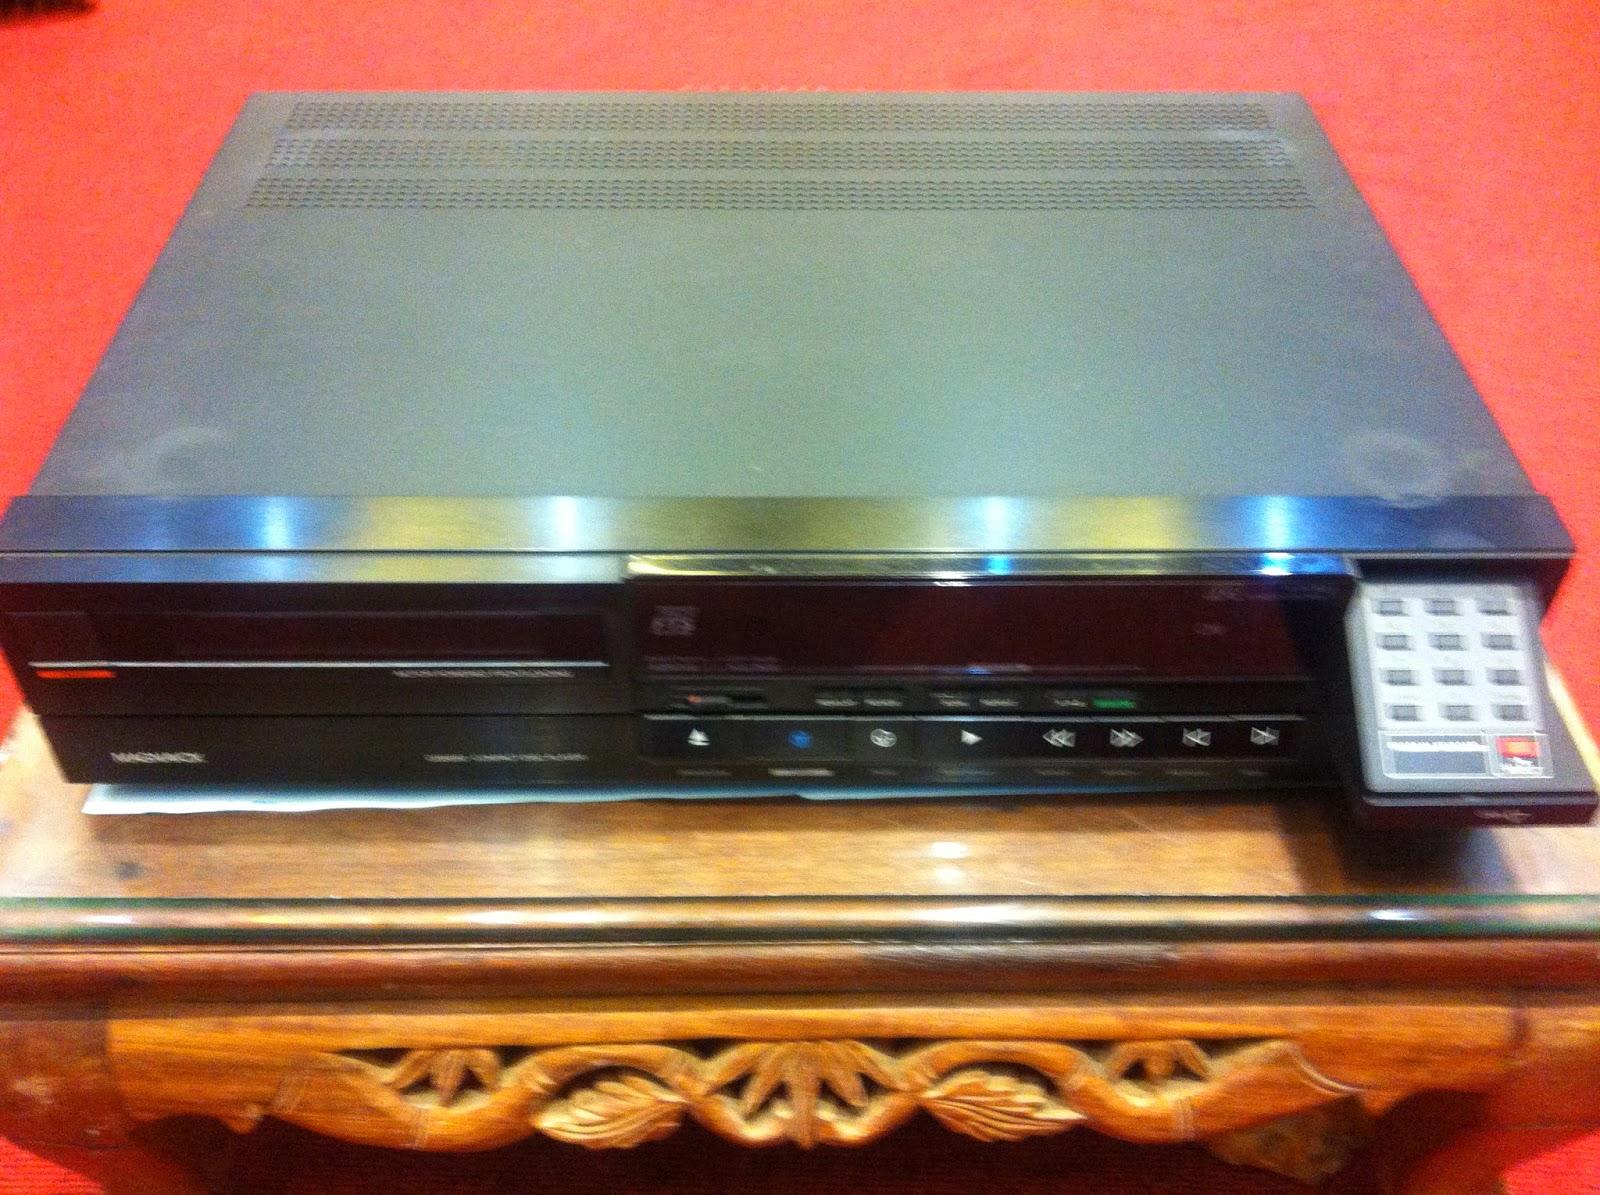 CD player - Magnavox 8650